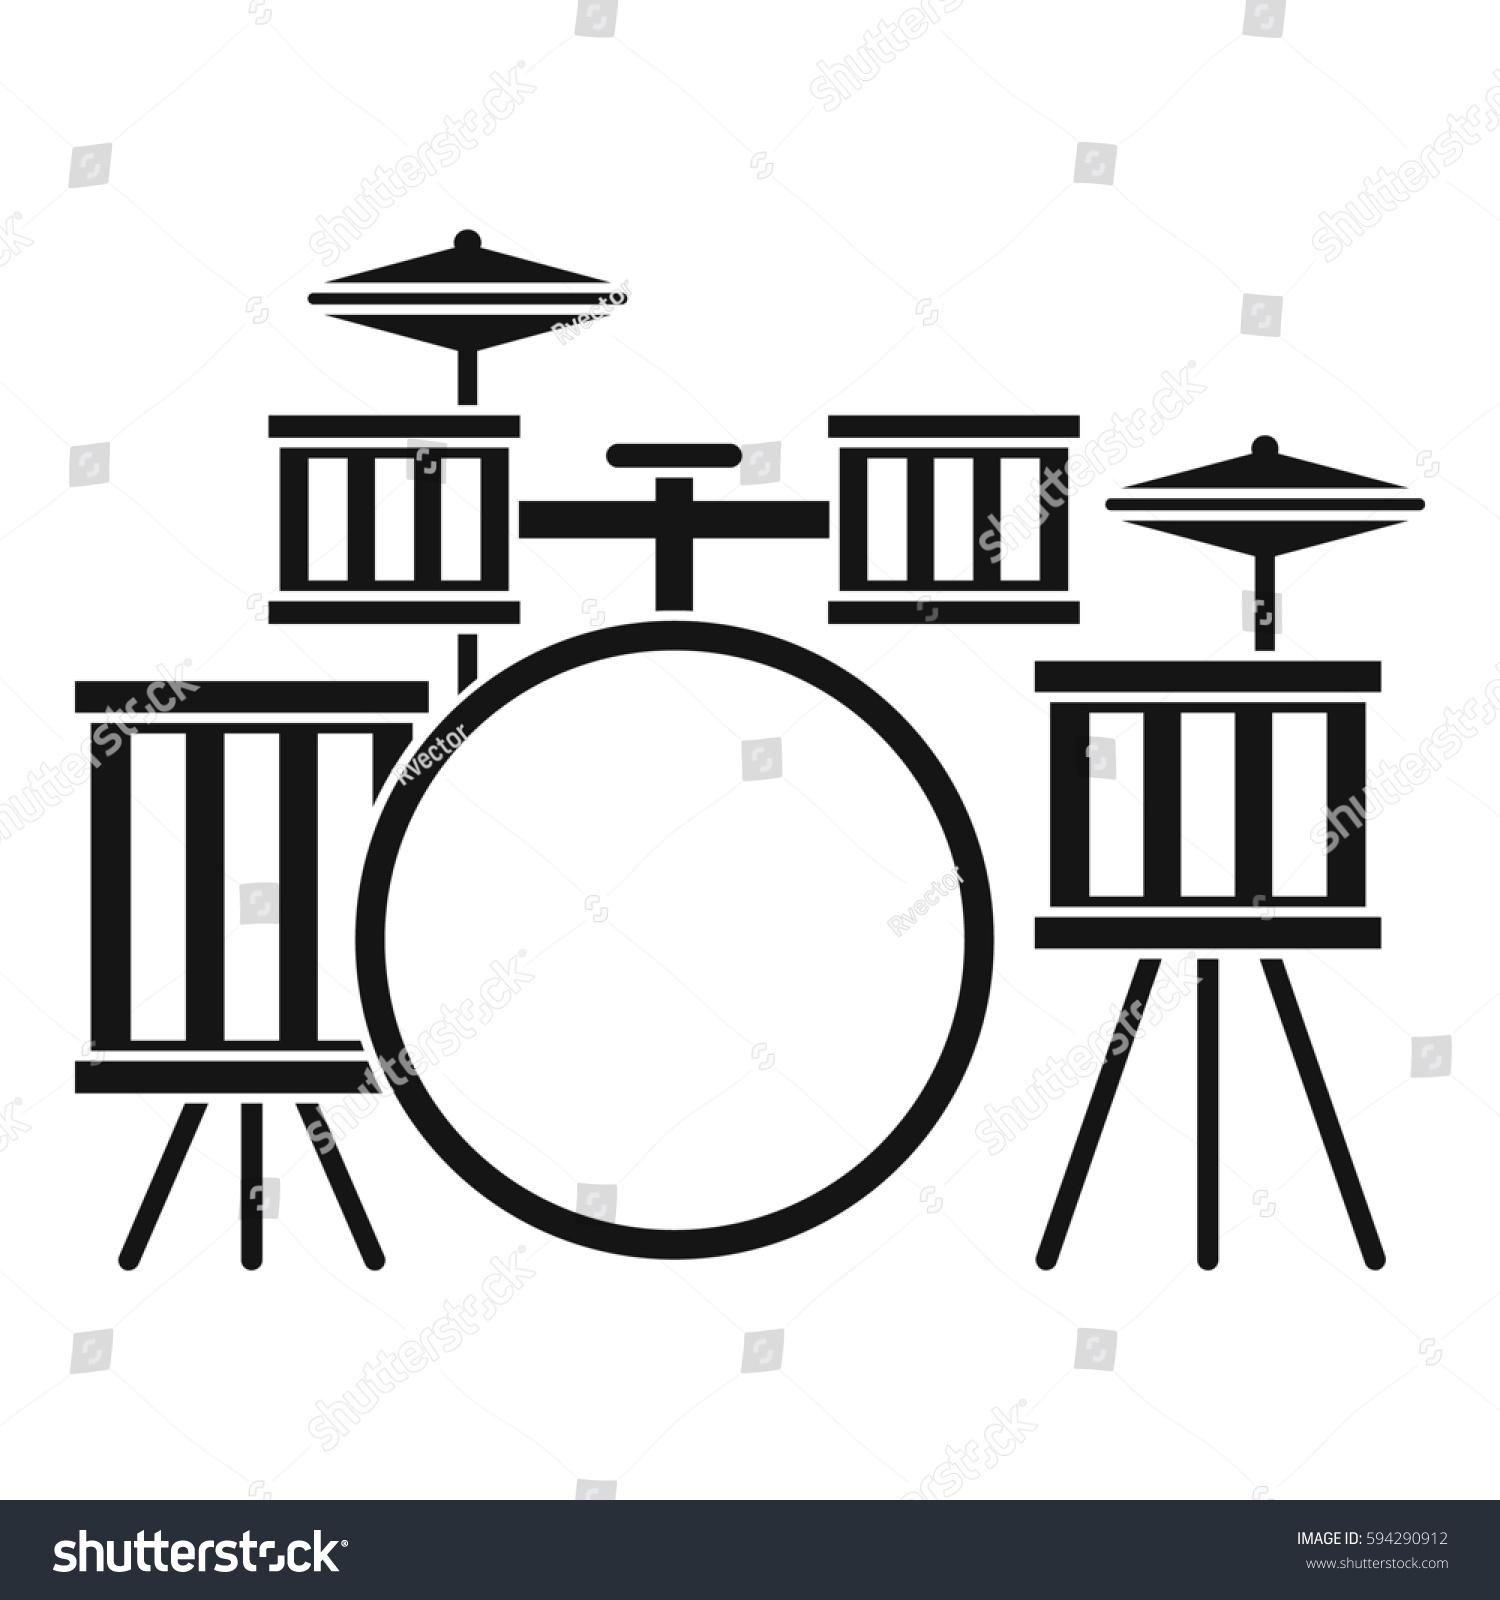 White Simple Drum Drawing Www Tollebild Com